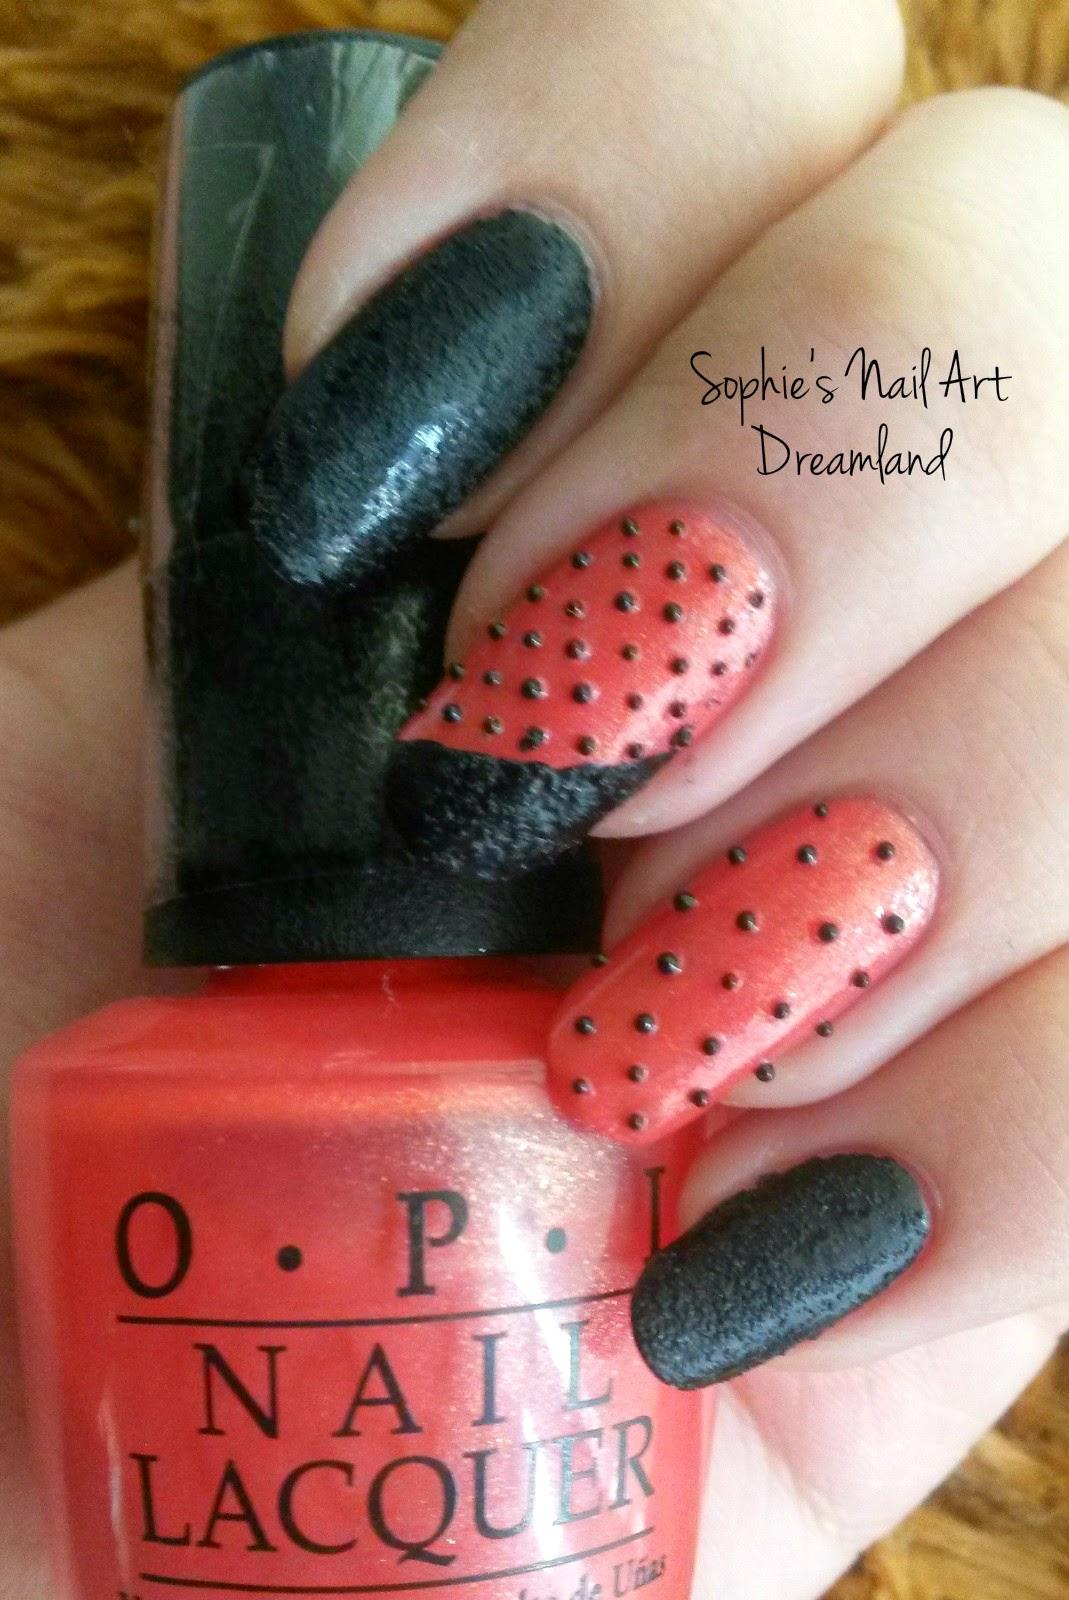 Funky Nail Caviar Designs Image Photos - Nail Art Ideas - morihati.com